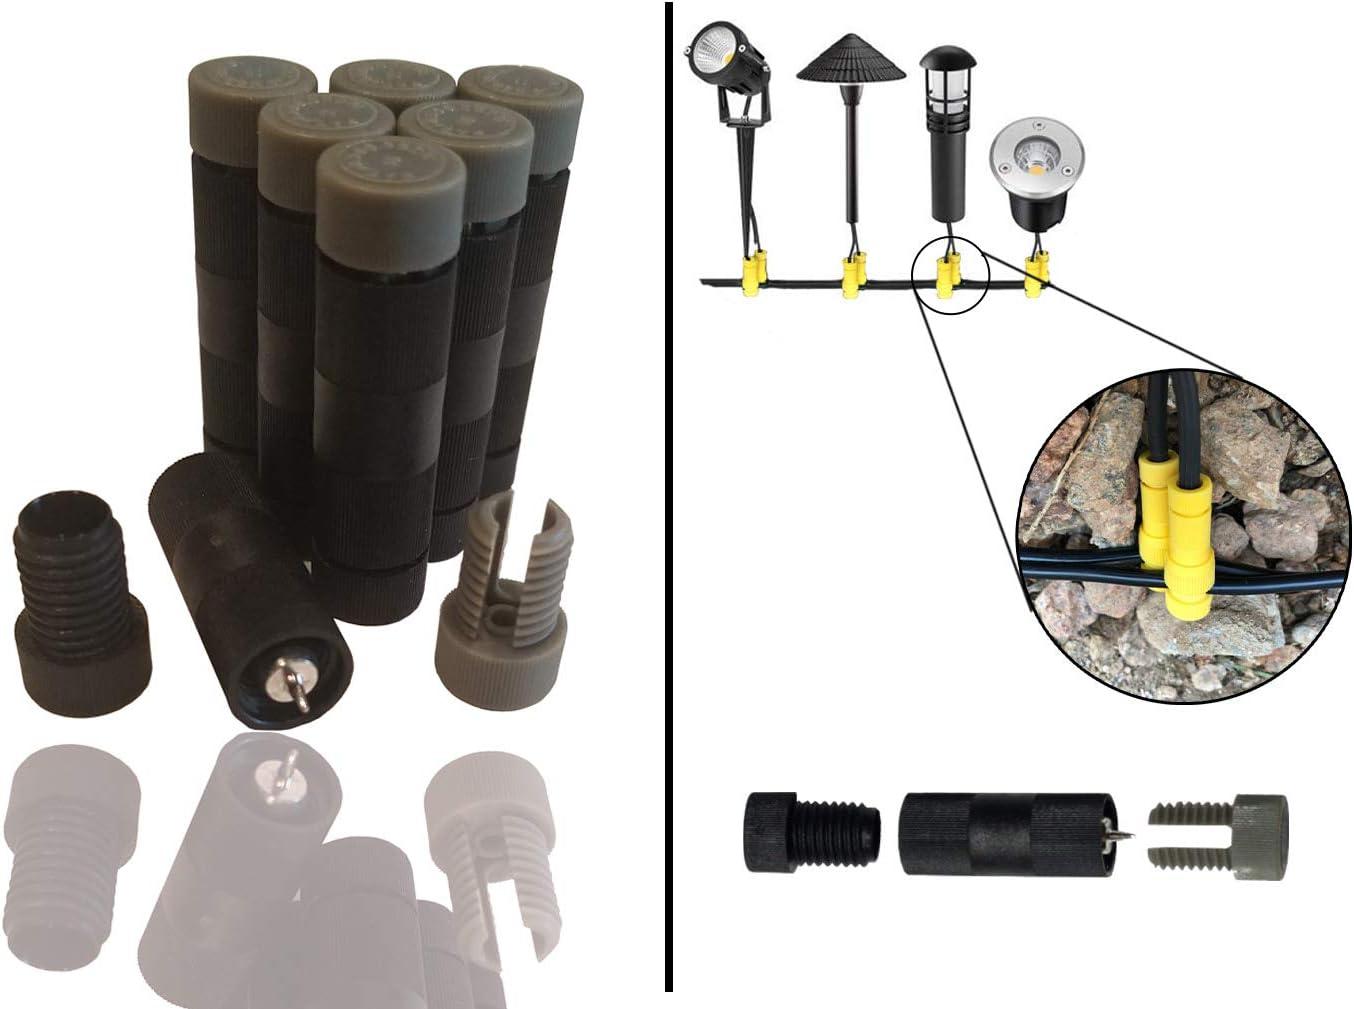 Modtek Low Voltage High Performance Piercing Connectors for Landscape Lights, Cable Connector for14-16 Gauge Wire – 50pc